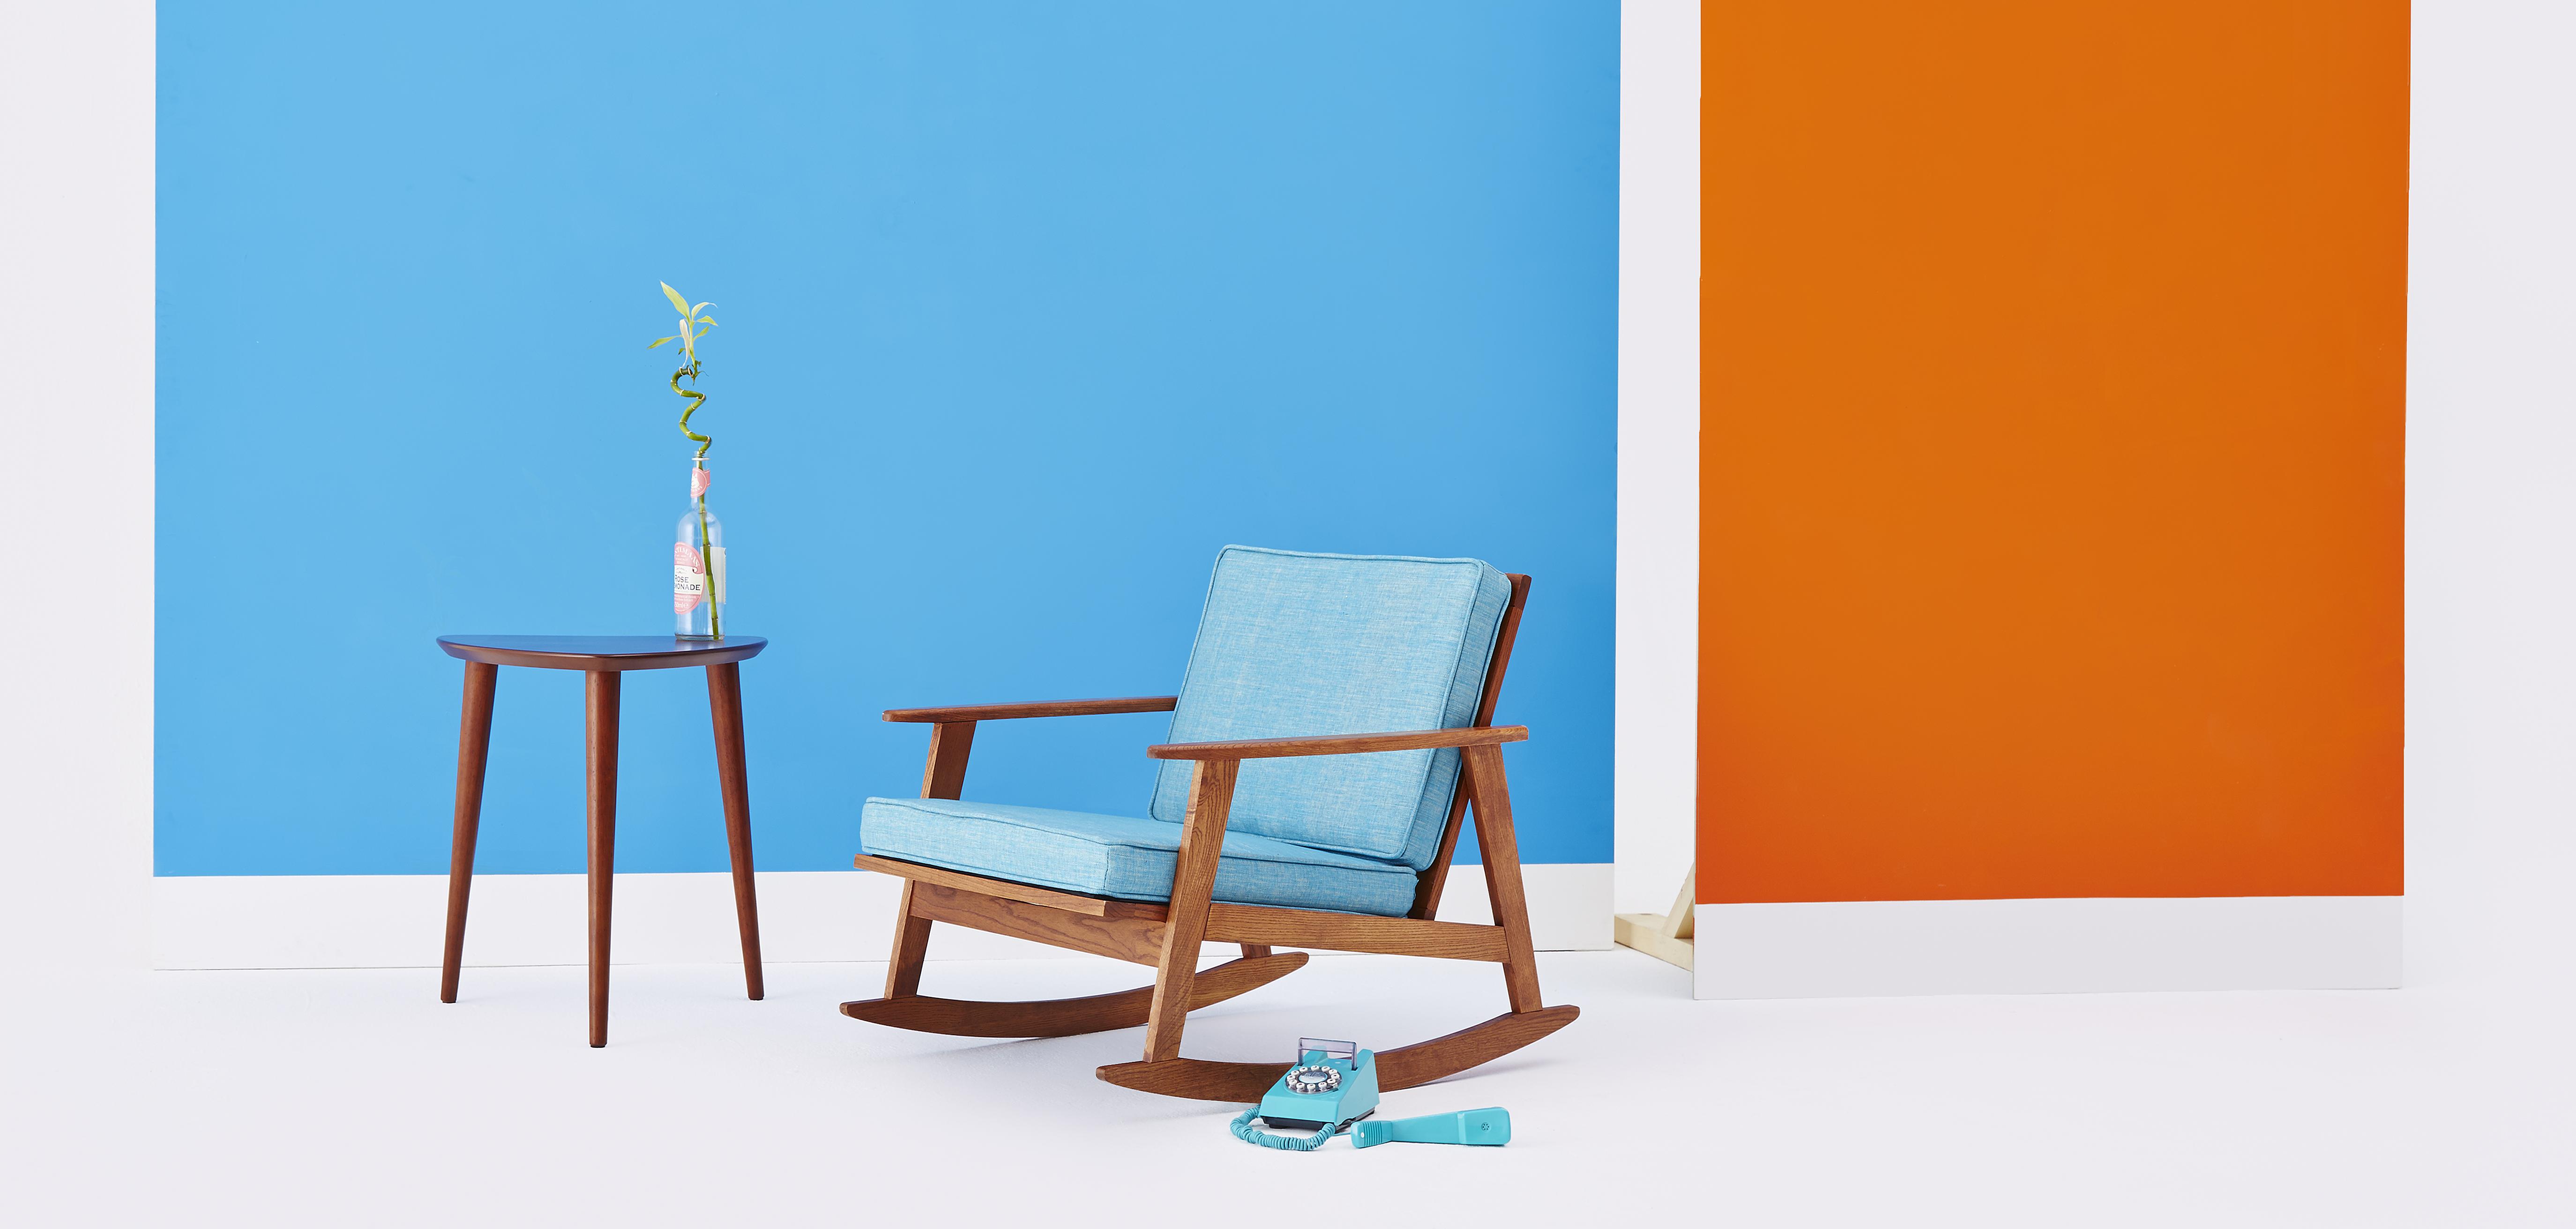 Wk 22_Modern Living_Chairs_Headline.jpg